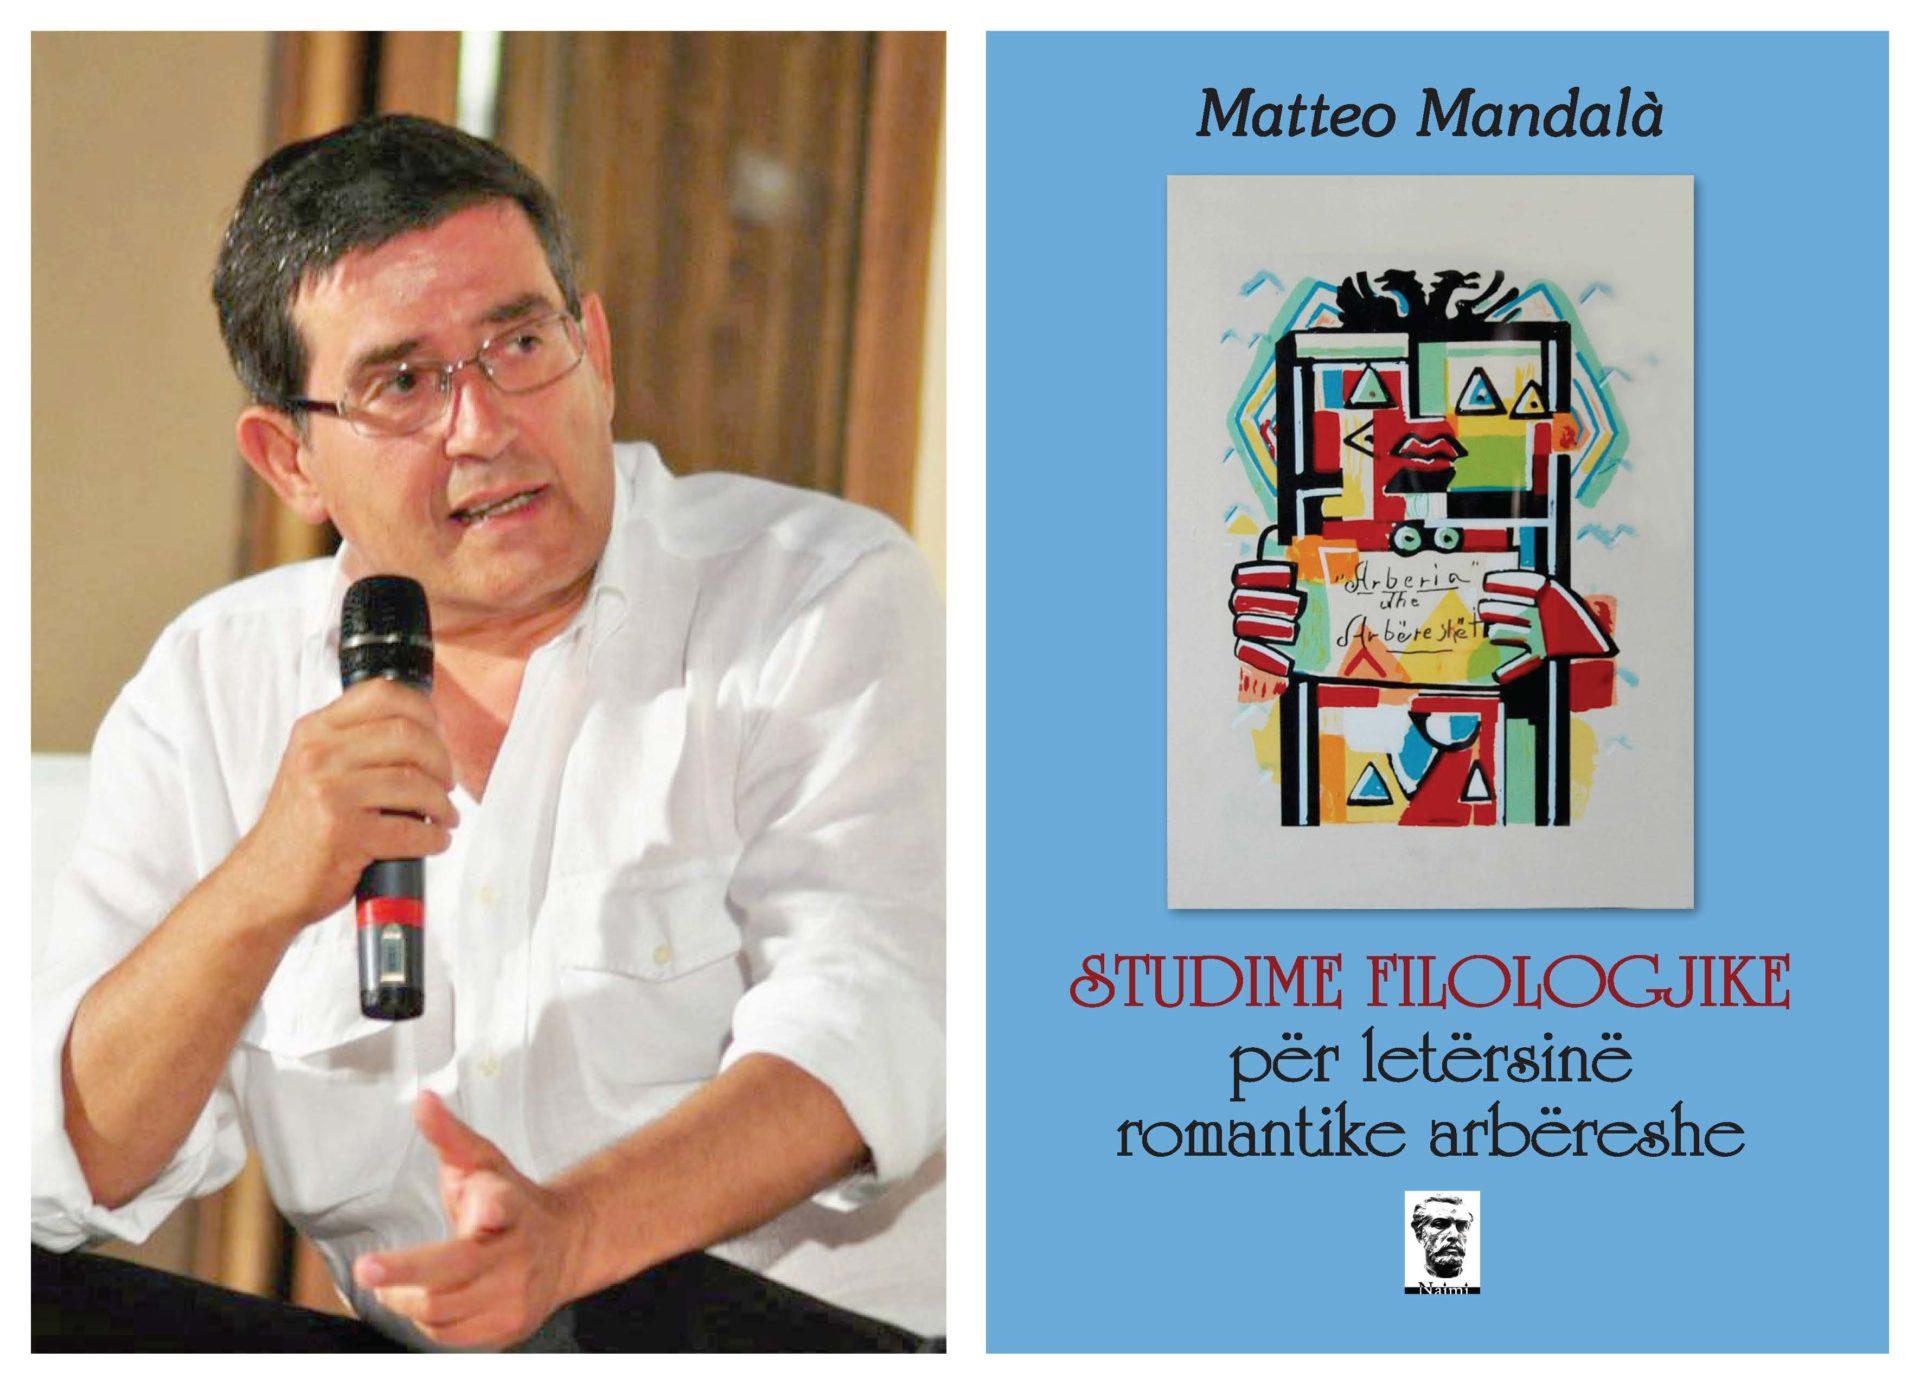 Matteo Mandala albanologo